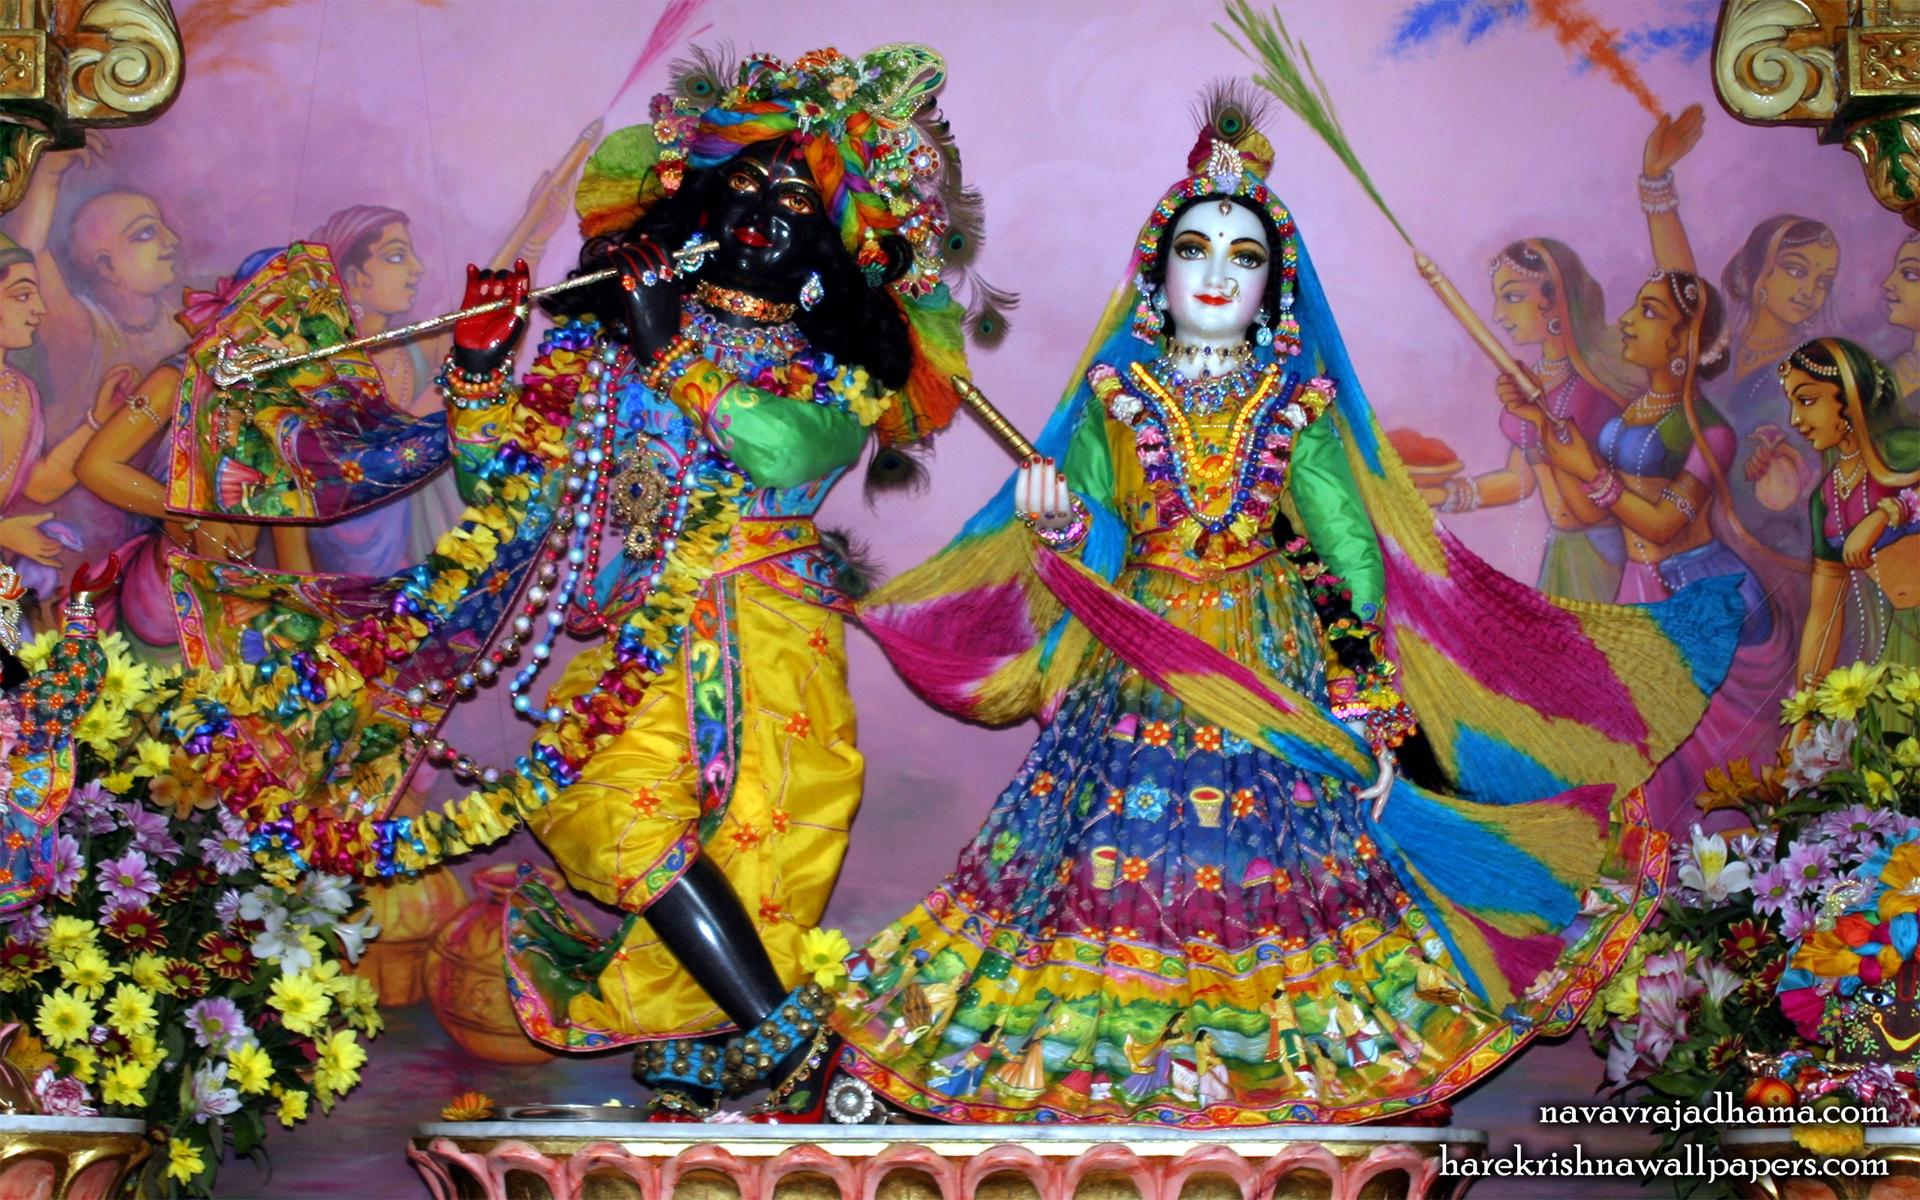 Sri Sri Radha Shyamsundar Wallpaper (026) Size 1920x1200 Download